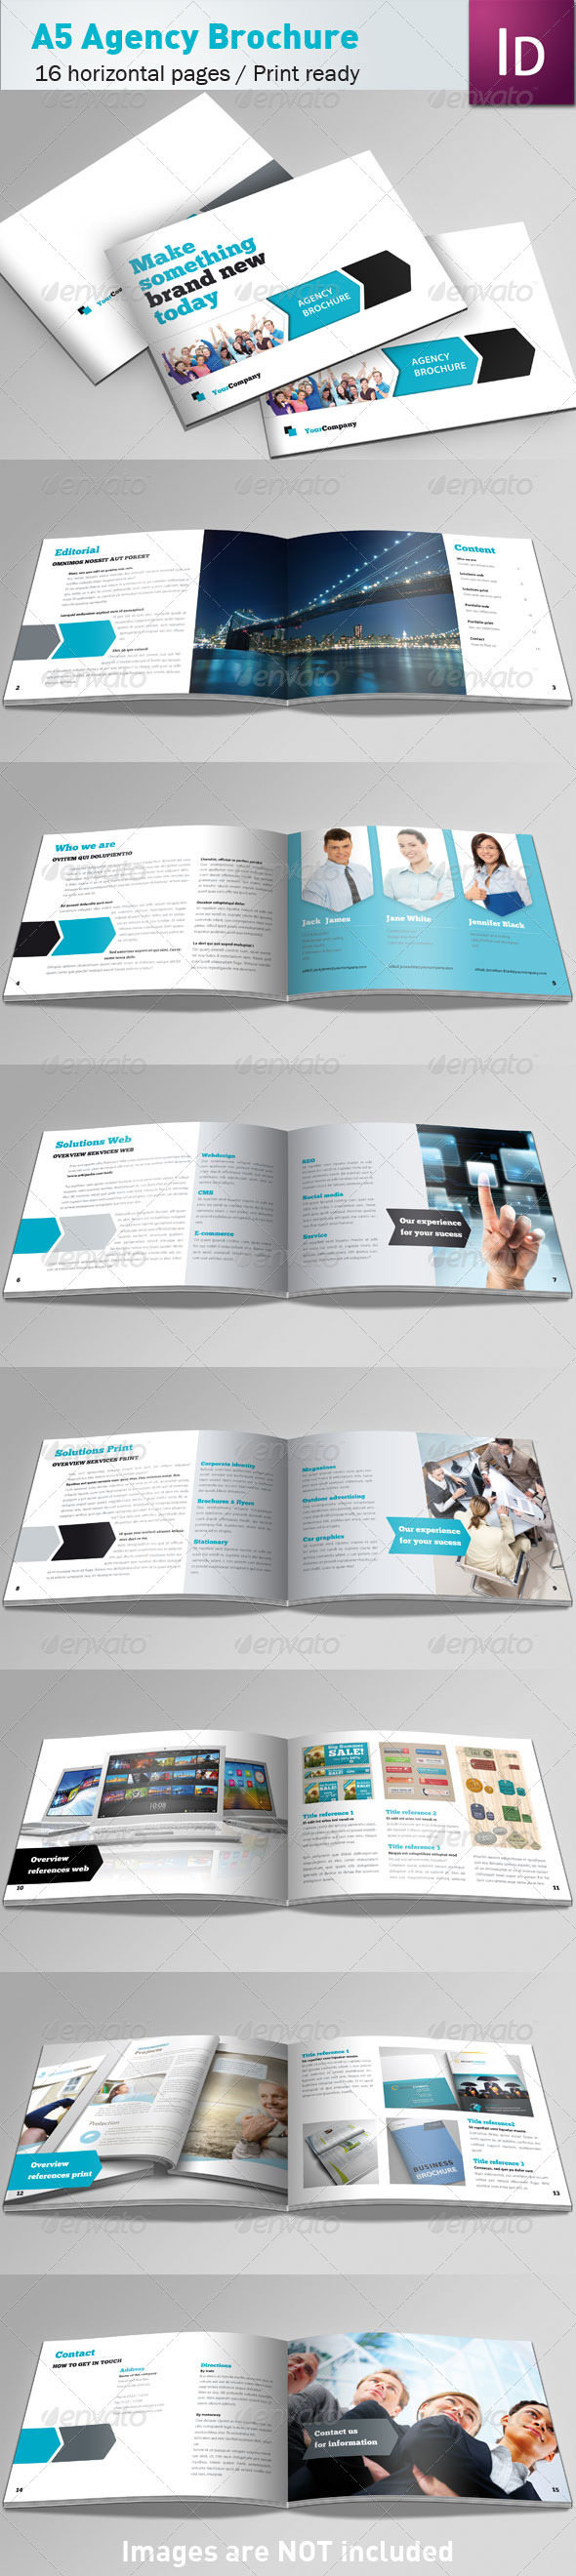 GraphicRiver Agency Brochure A5 540007